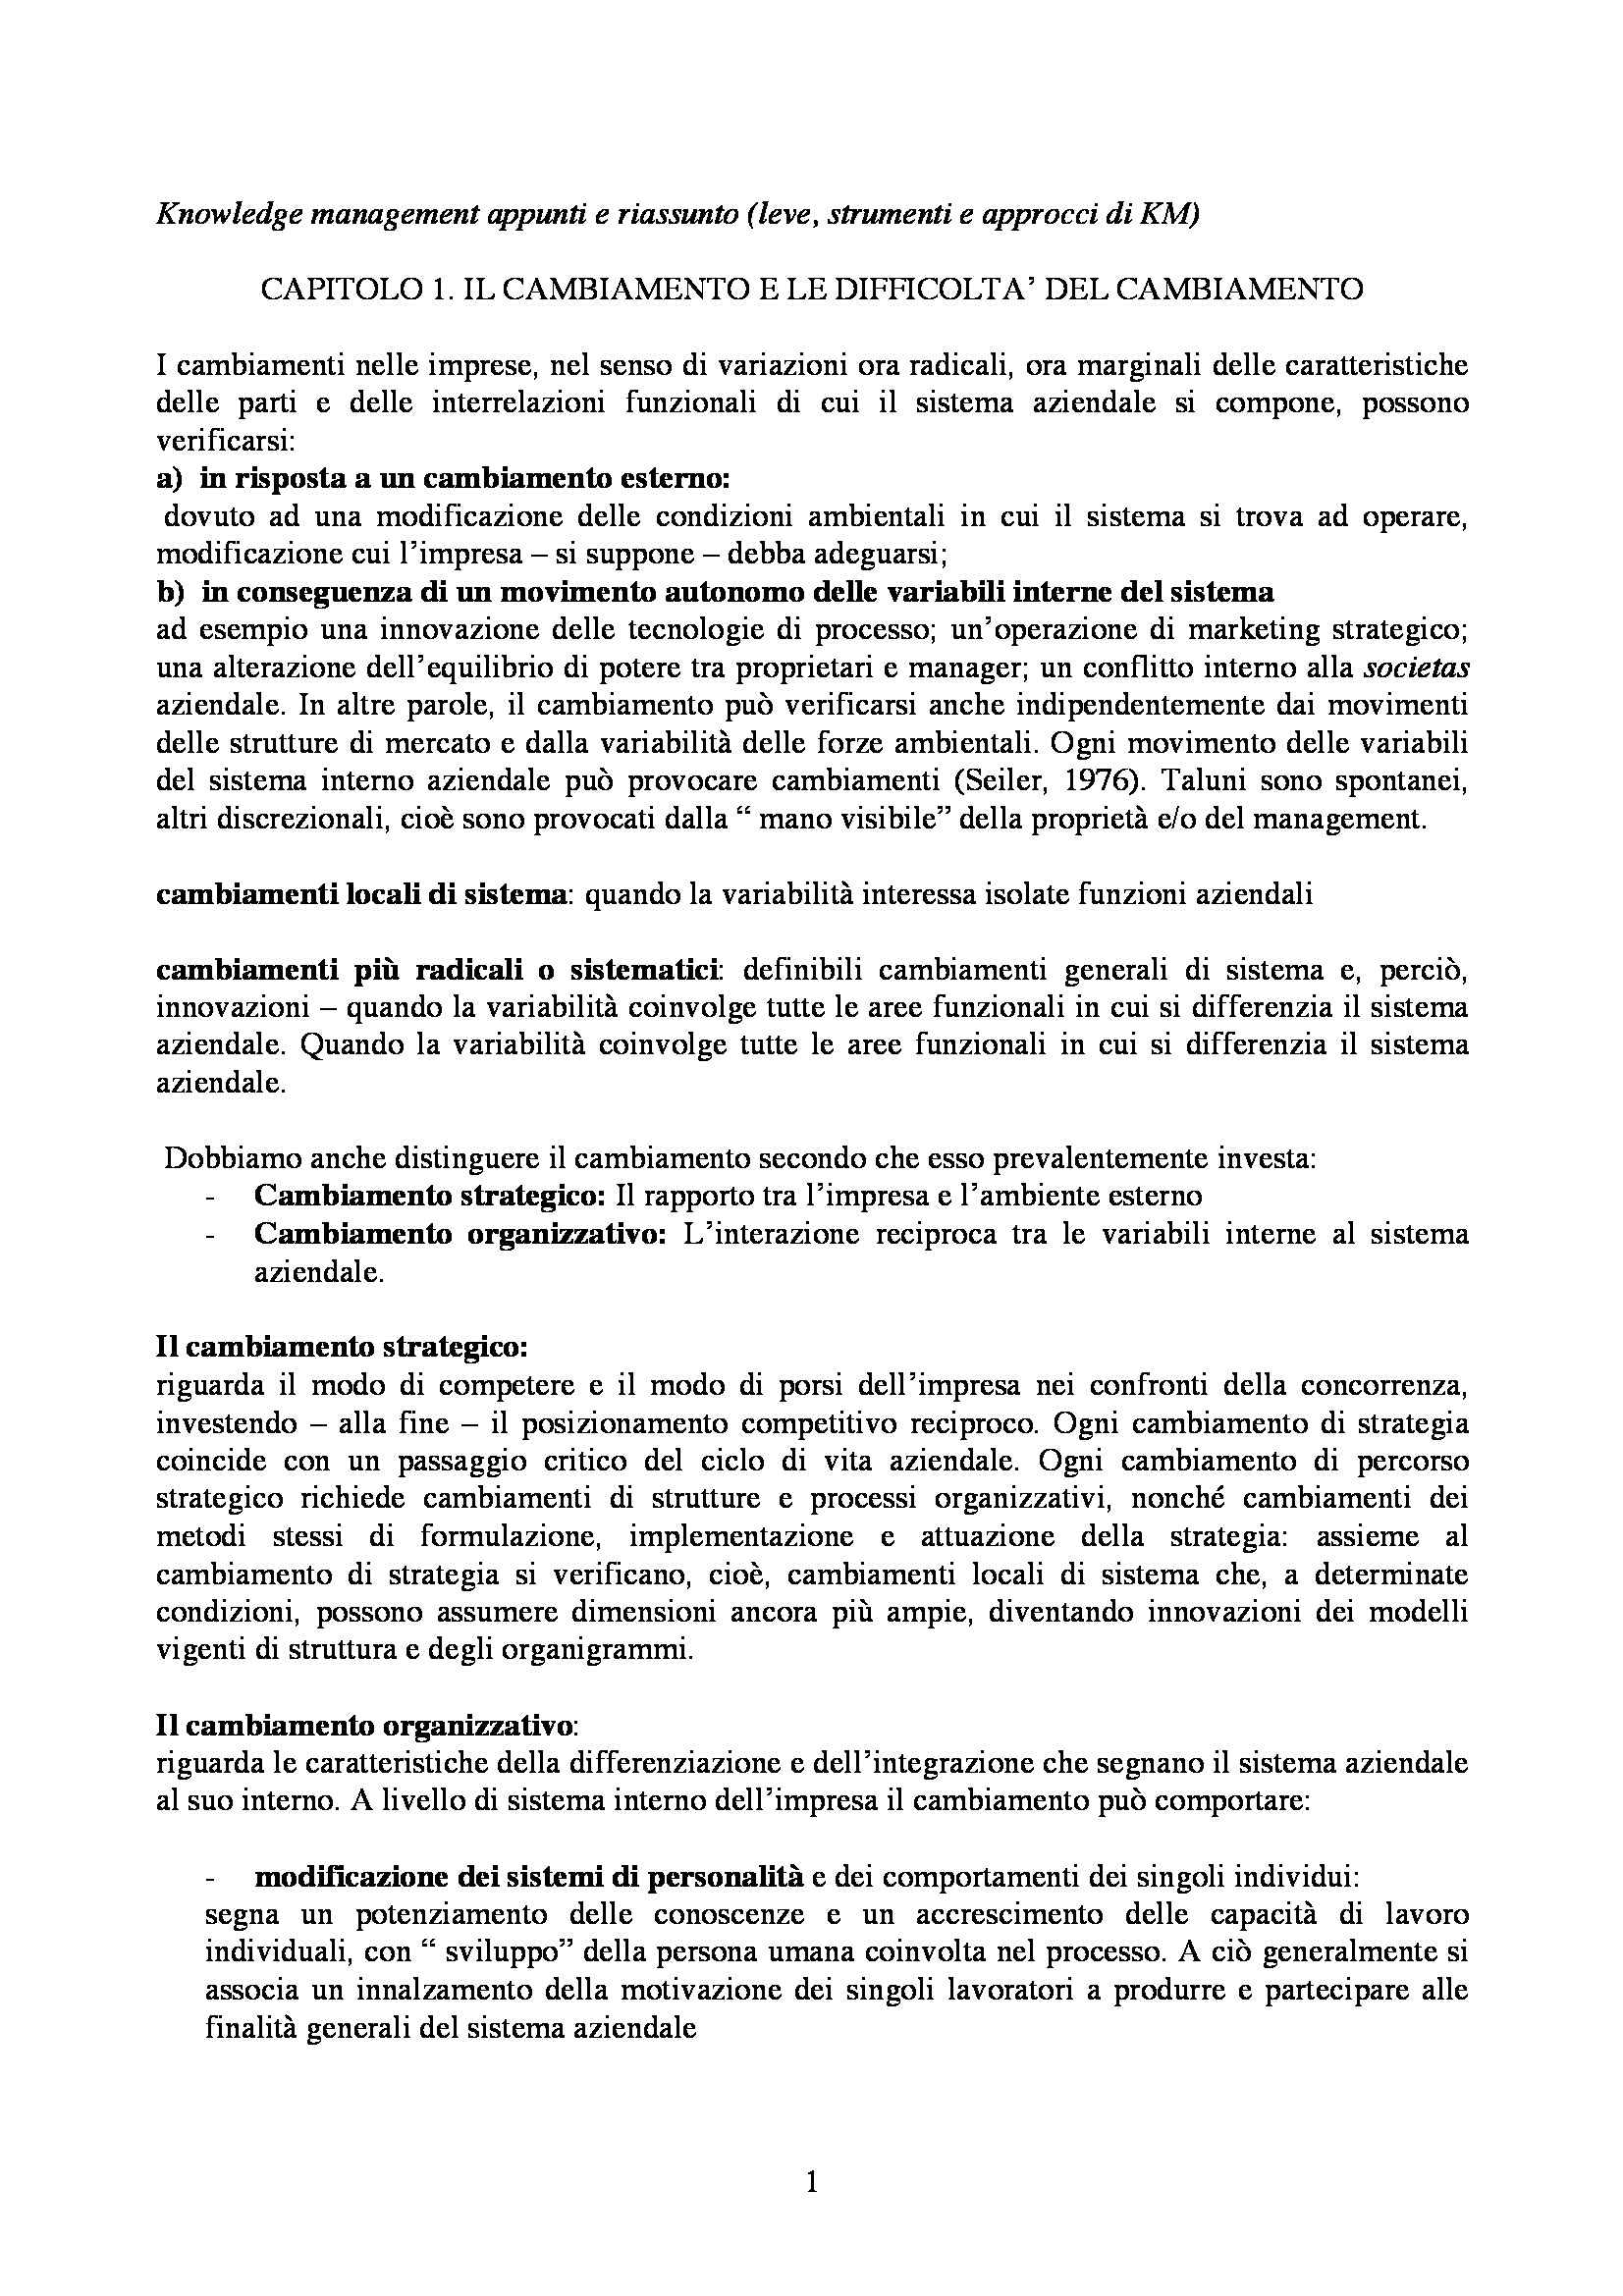 Knowledge Management: Riassunto esame, Appunti e Schemi, prof. Paniccia